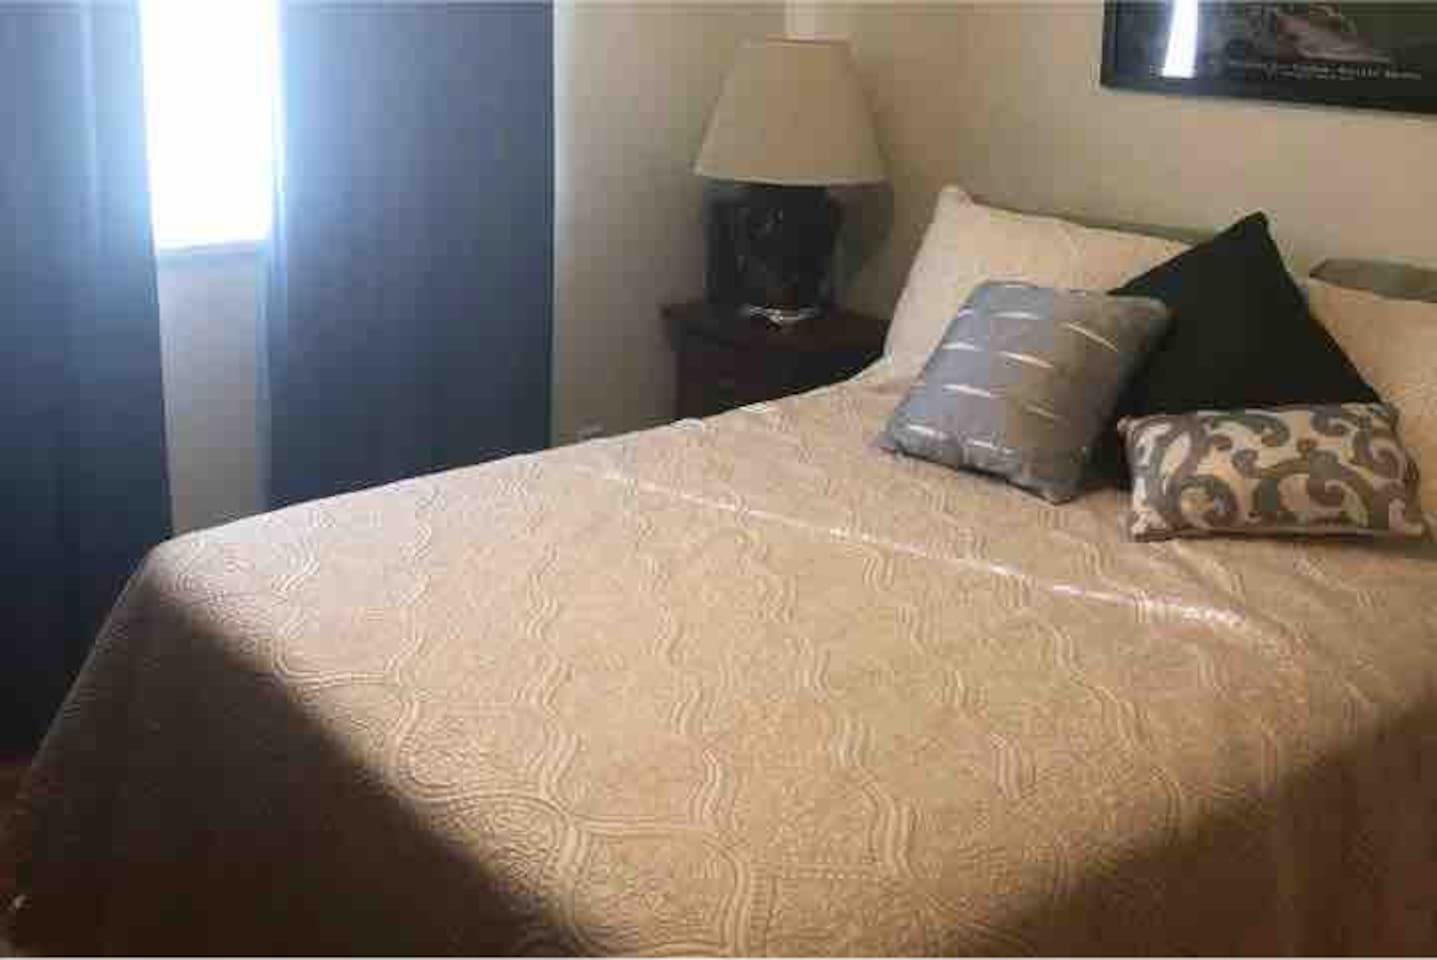 Full size memory foam mattress and plenty of pillows, dresser, nightstand, and closet.